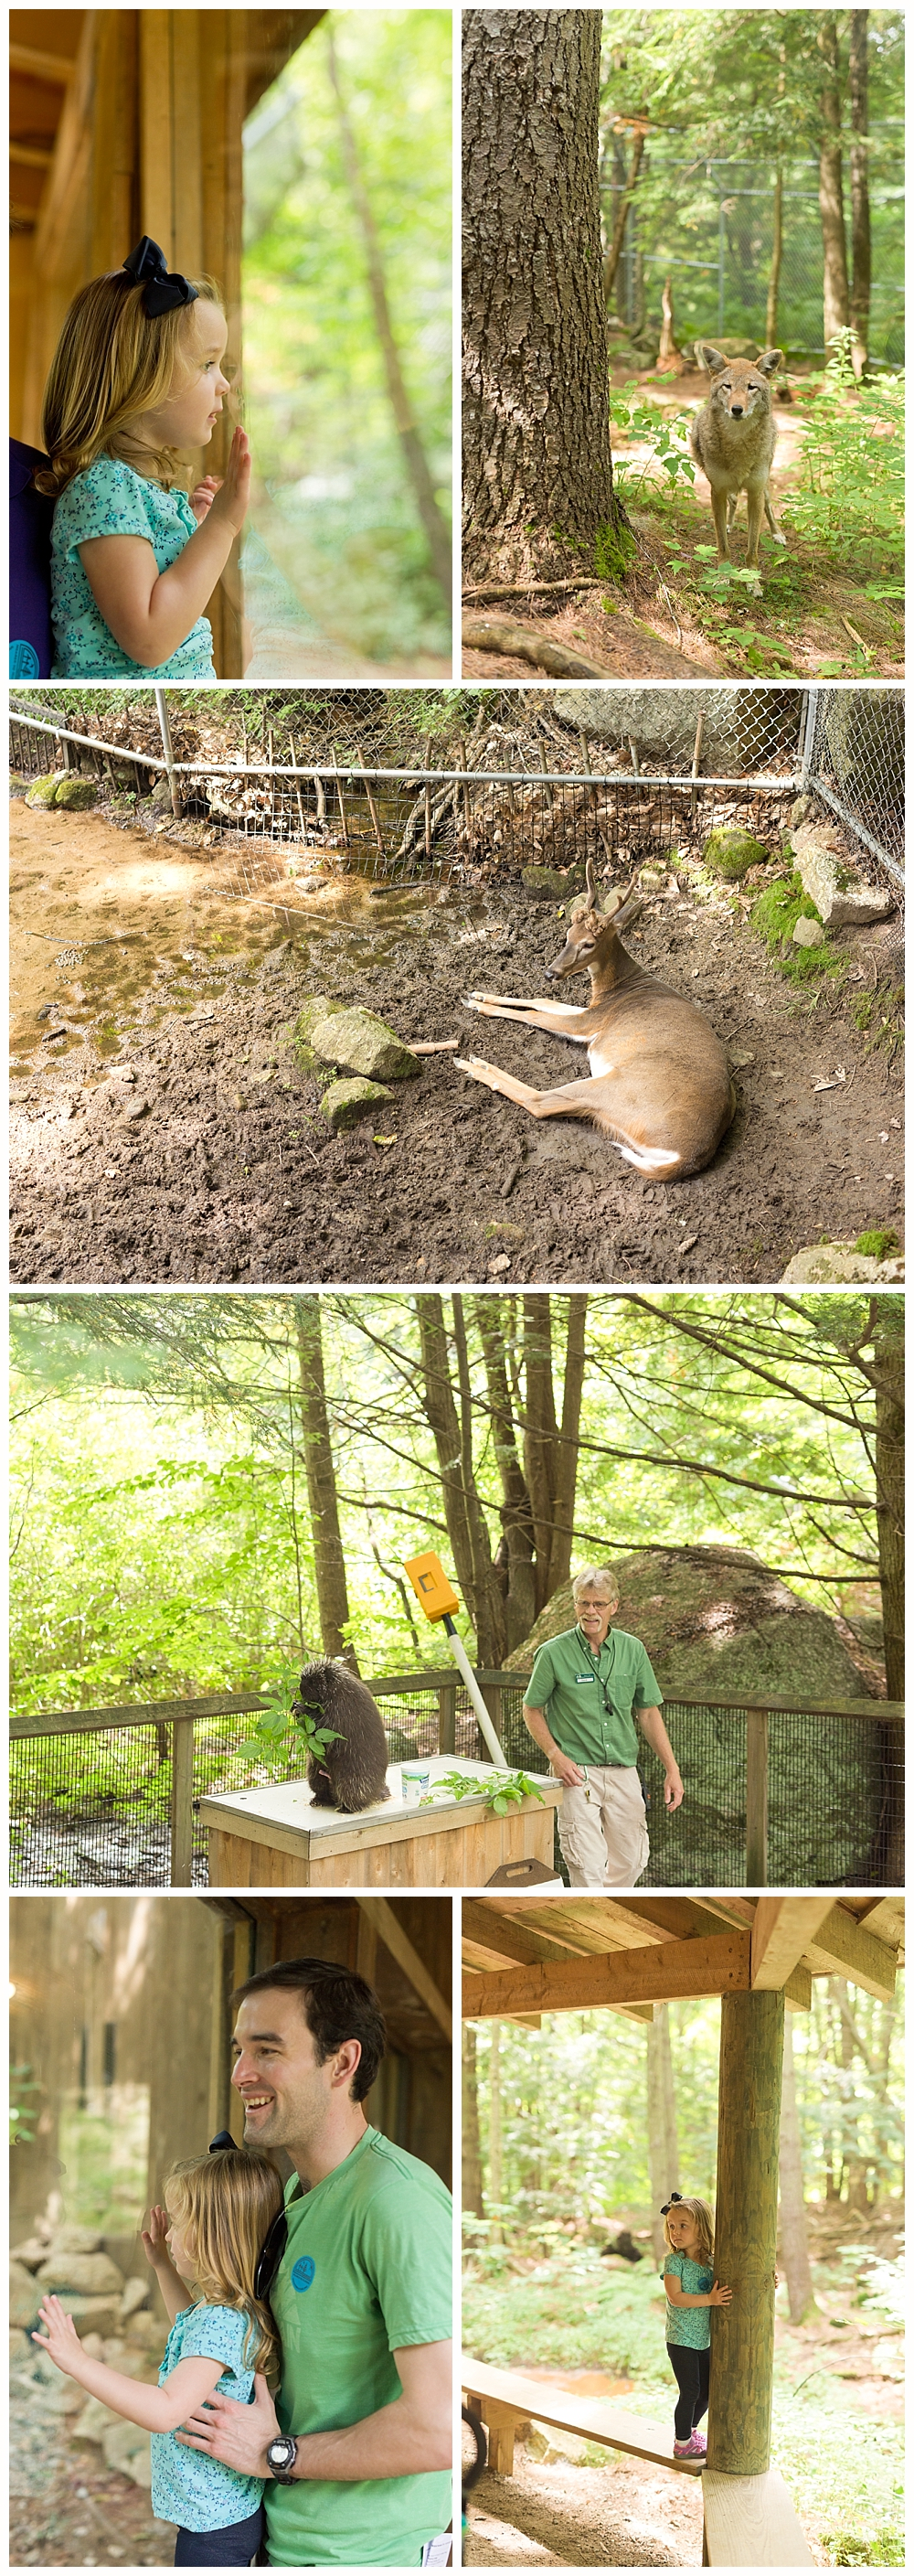 animals at Squam Lakes Natural Science Center